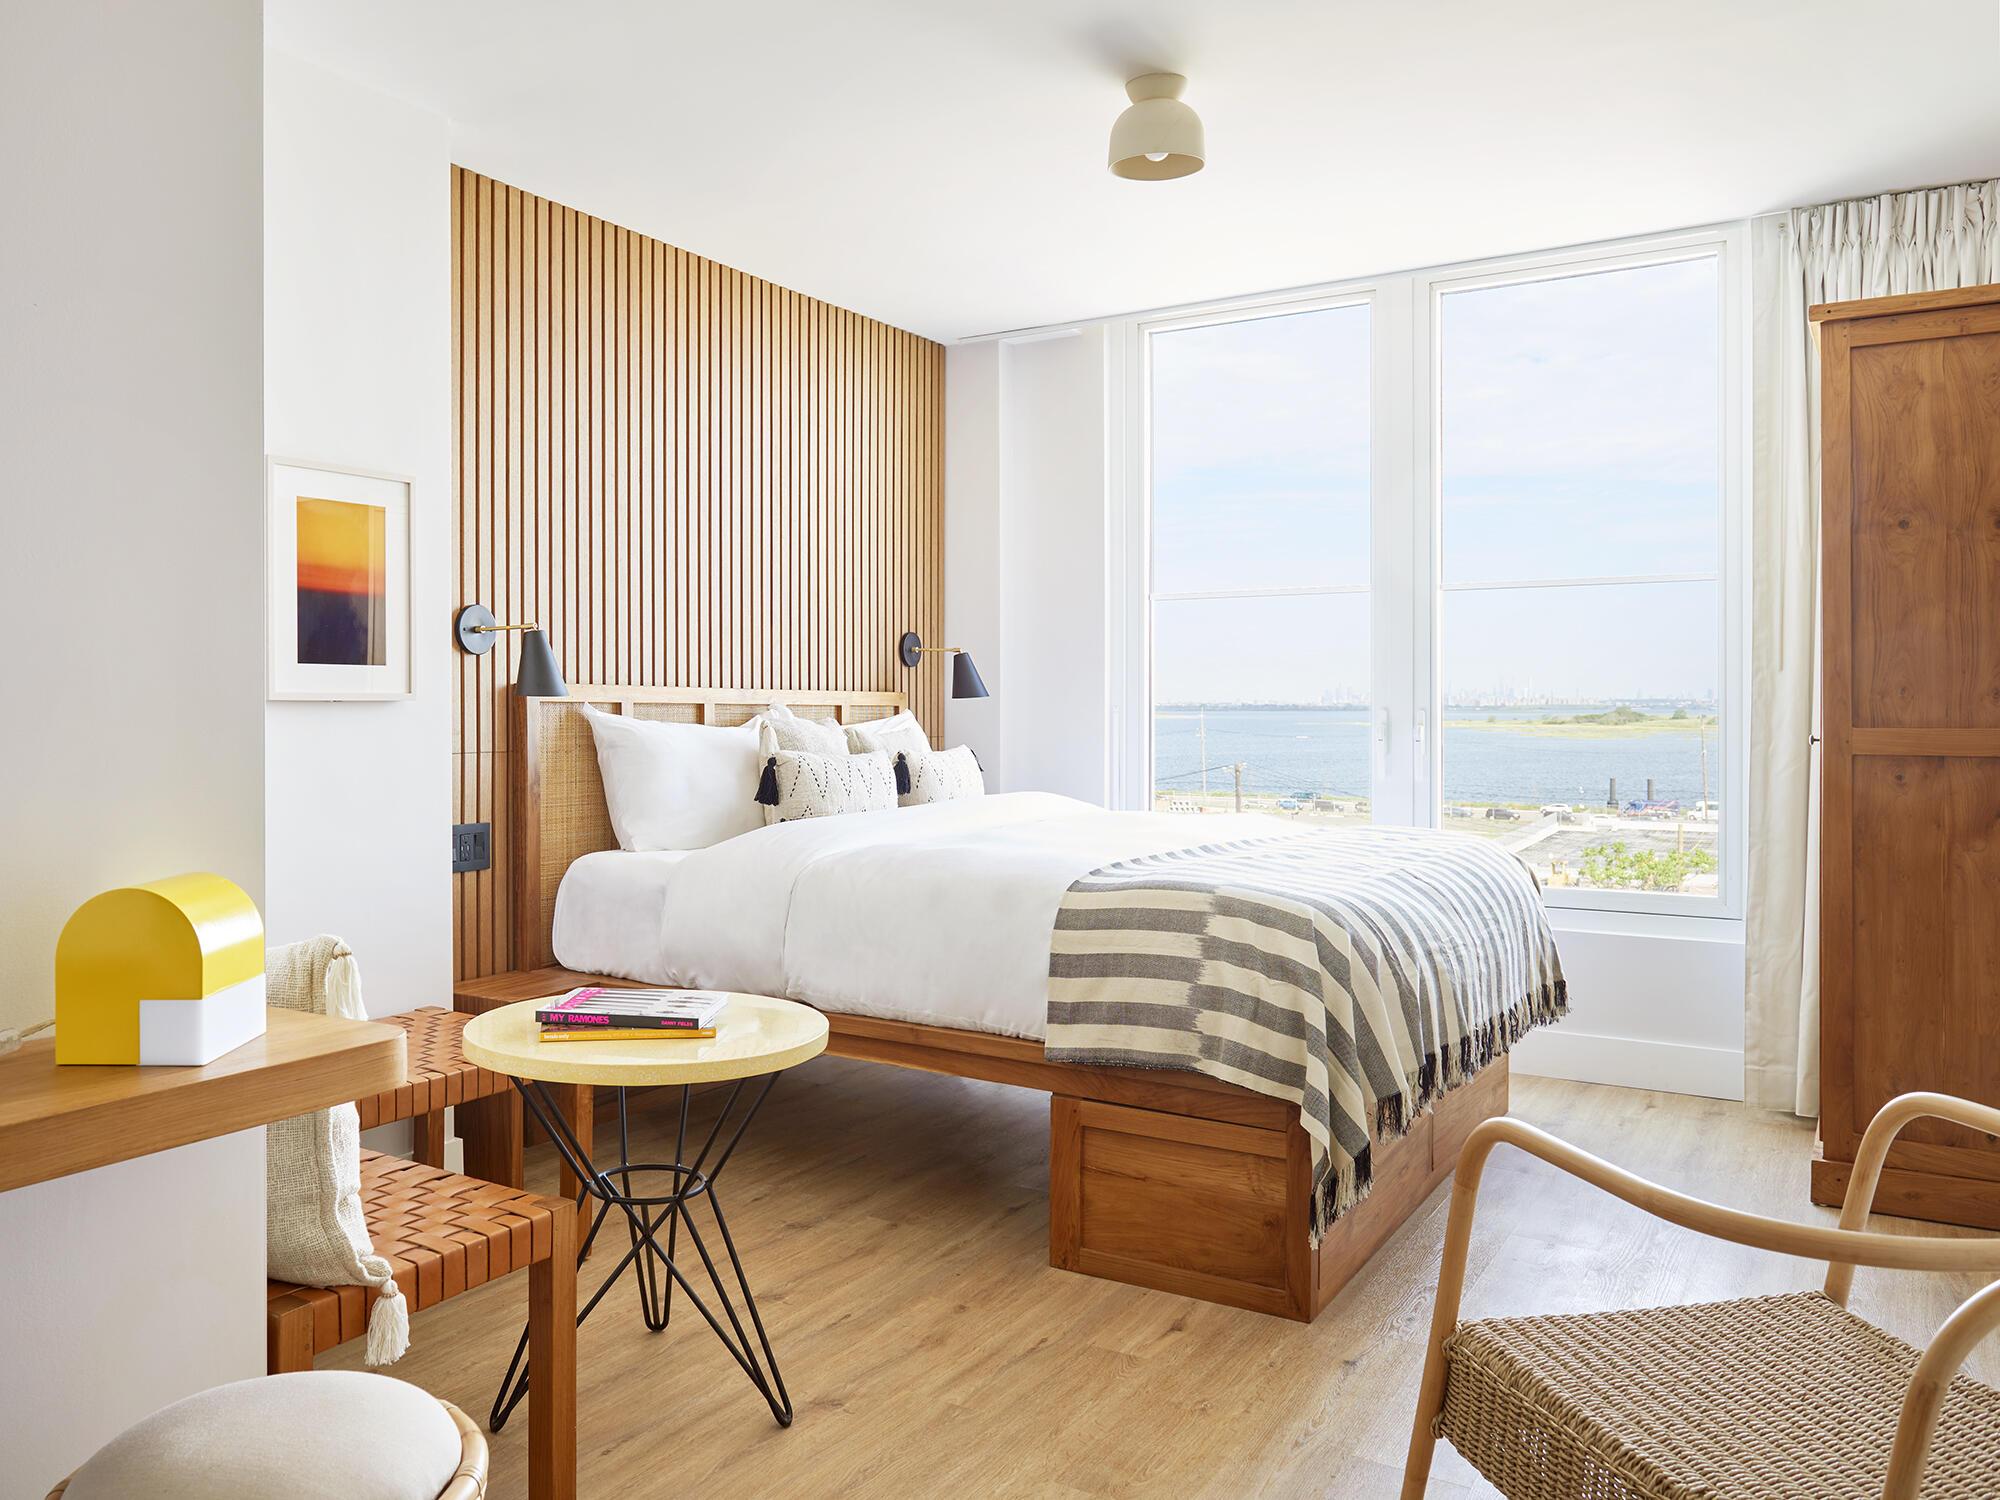 King bed in Bedroom in Deluxe King Bay at The Rockaway Hotel